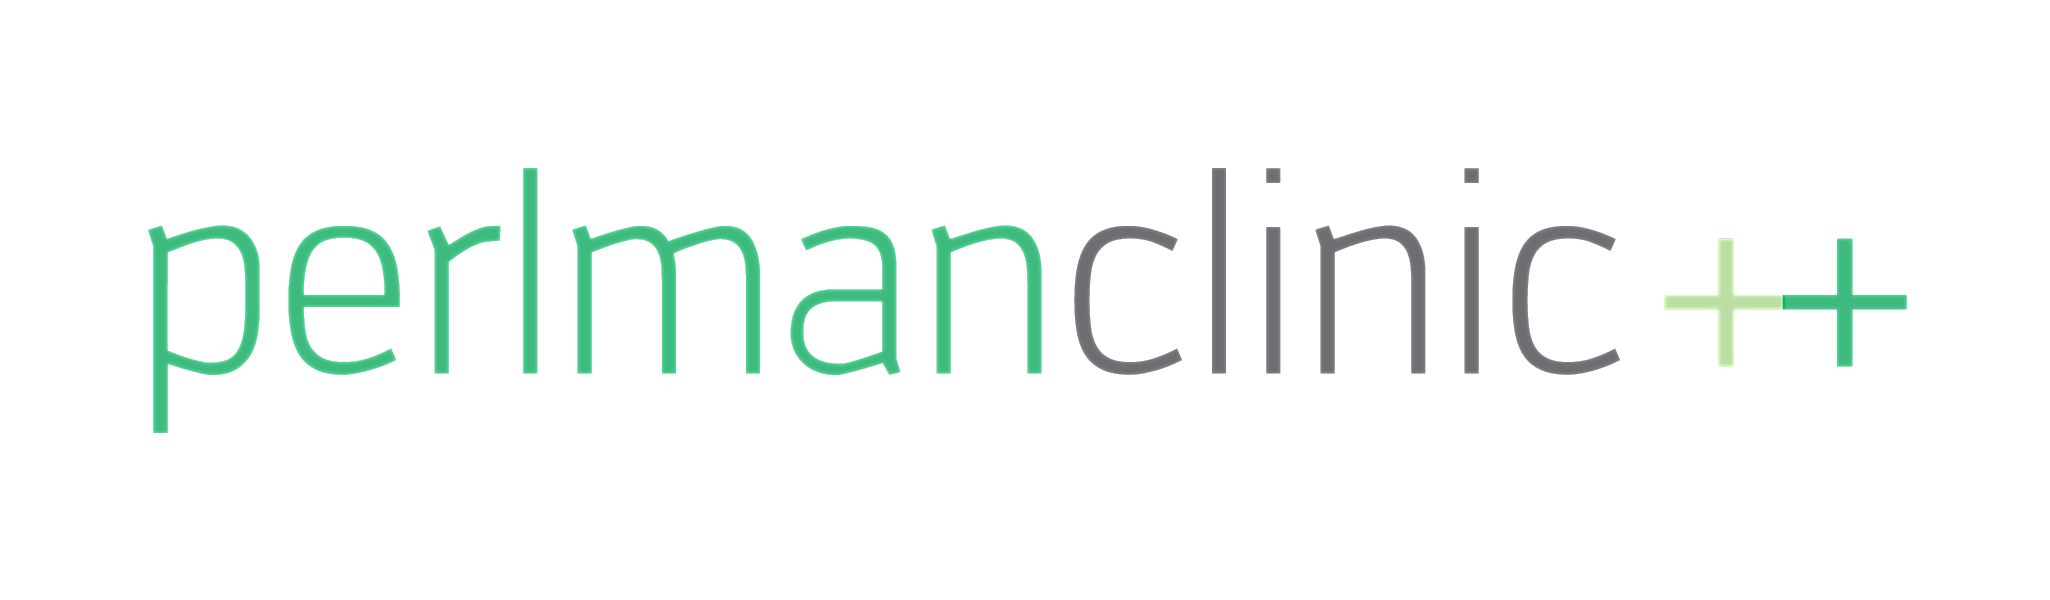 Perlman Clinic - Downtown La Jolla Logo